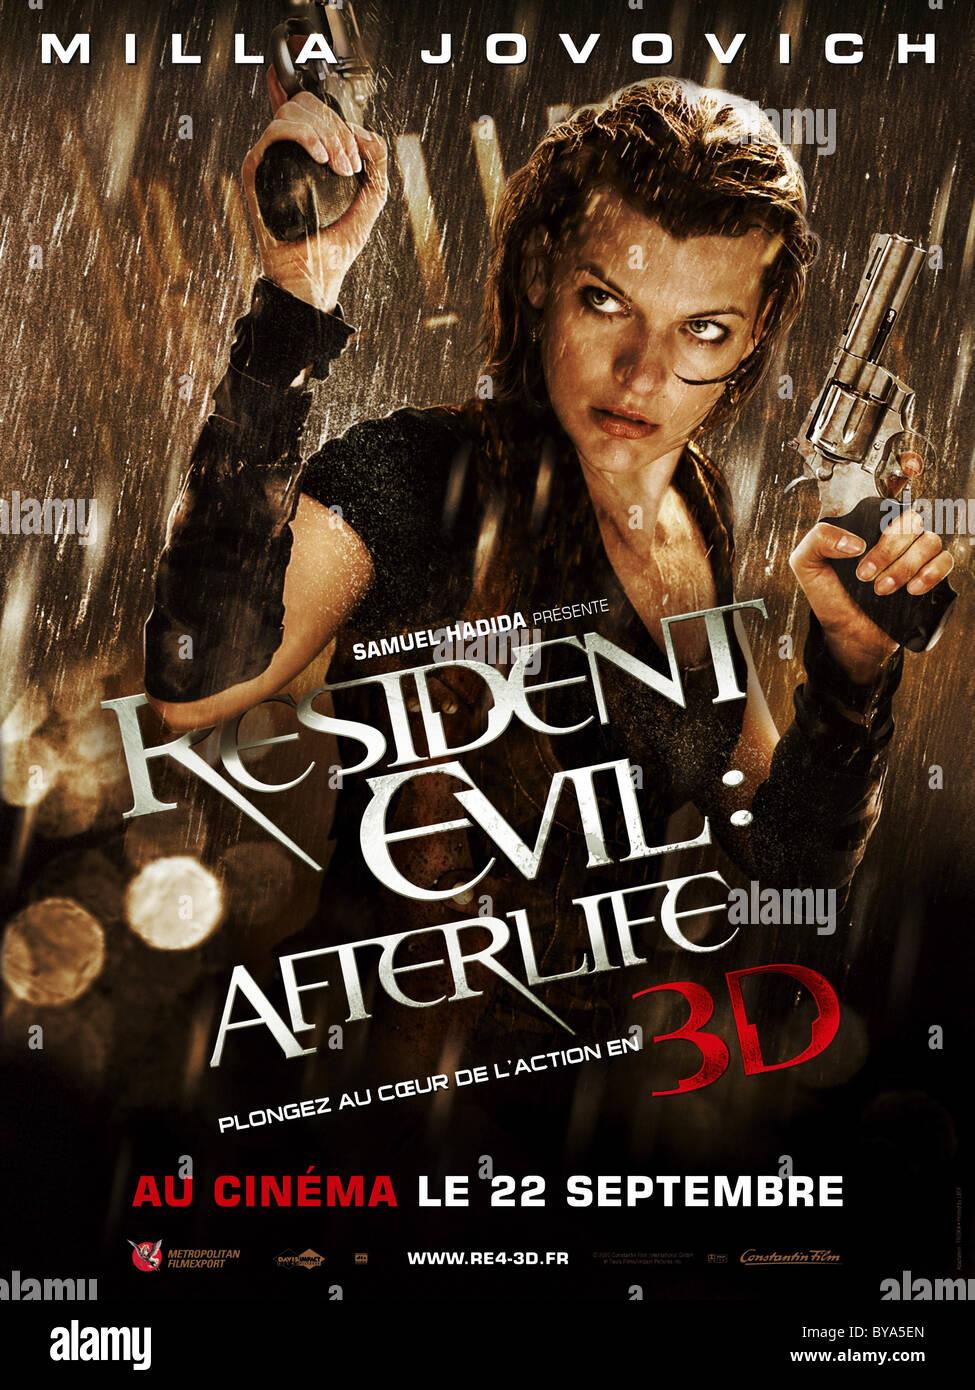 Resident Evil : Afterlife Anno : 2010 USA / UK Direttore : Paul W.S. Anderson Milla Jovovich film poster (Fr) Immagini Stock